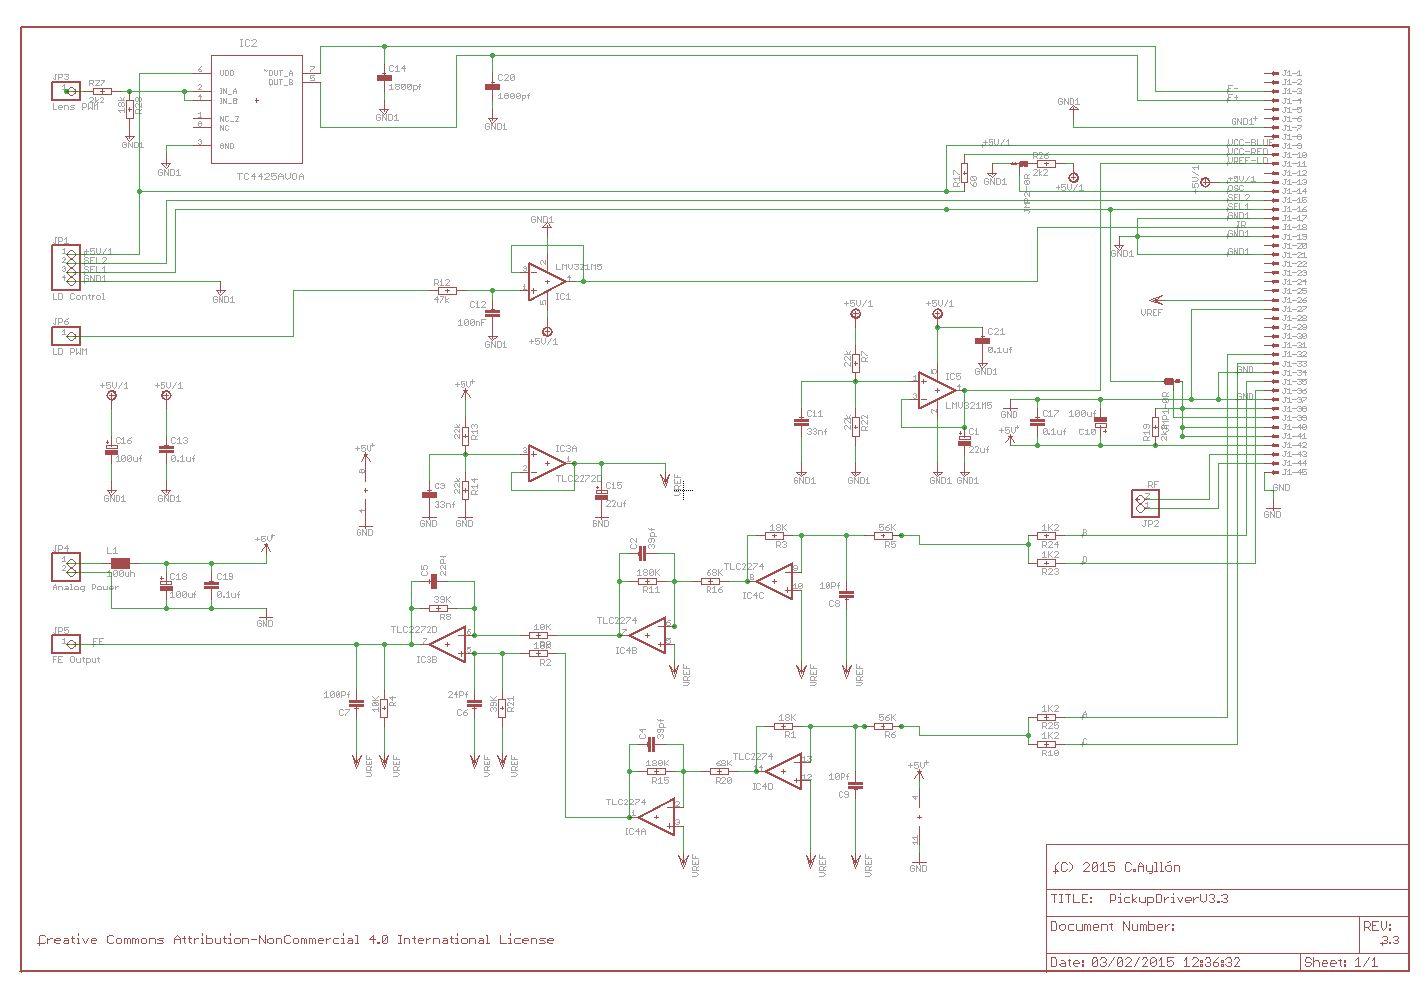 class 3b laser diagram dimarzio ultra jazz wiring diagrams twinteeth assembling the toolhead diyouware